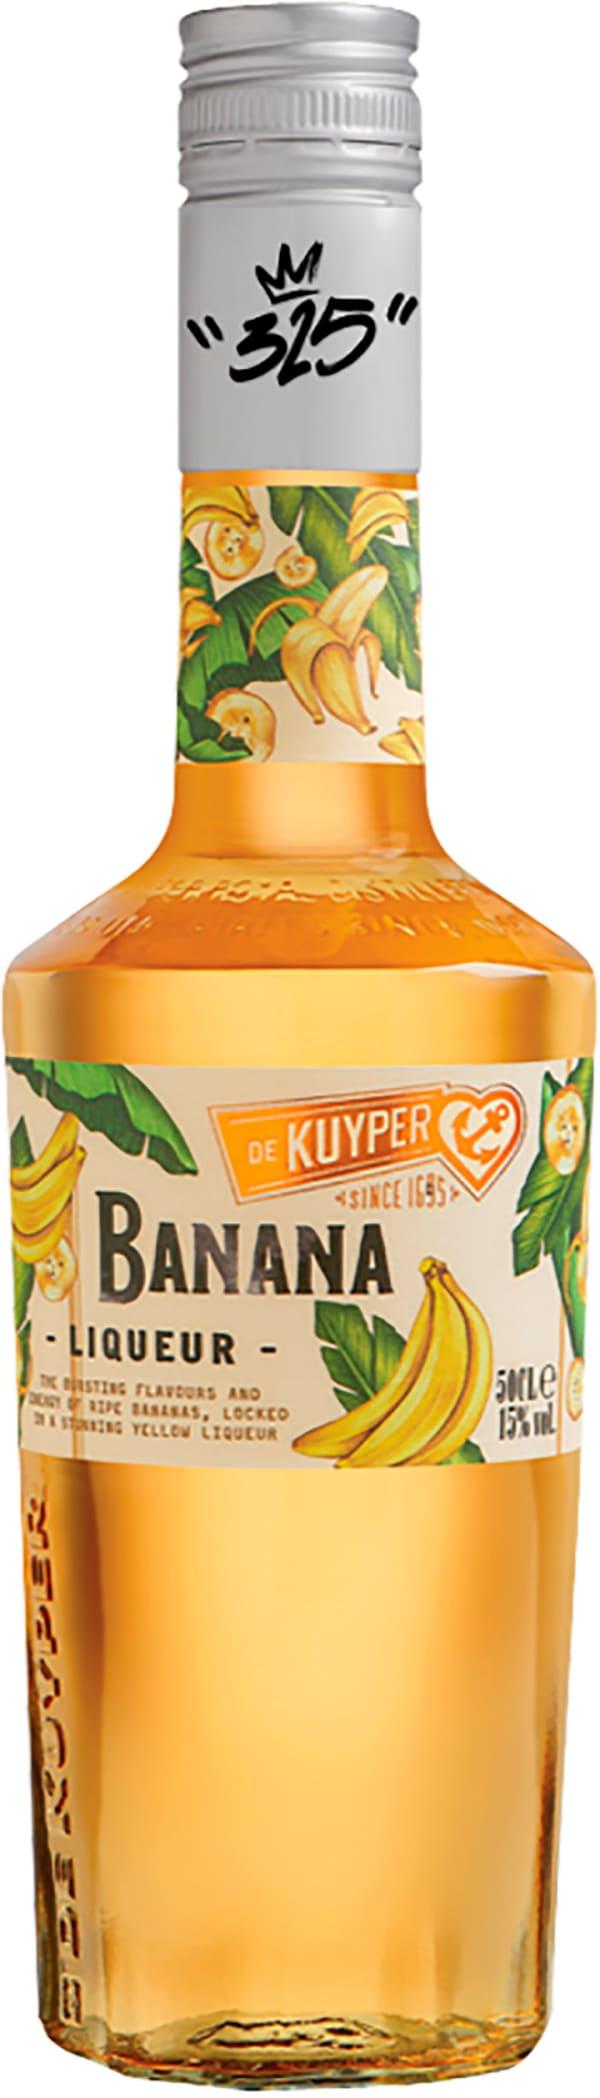 De Kuyper Banana